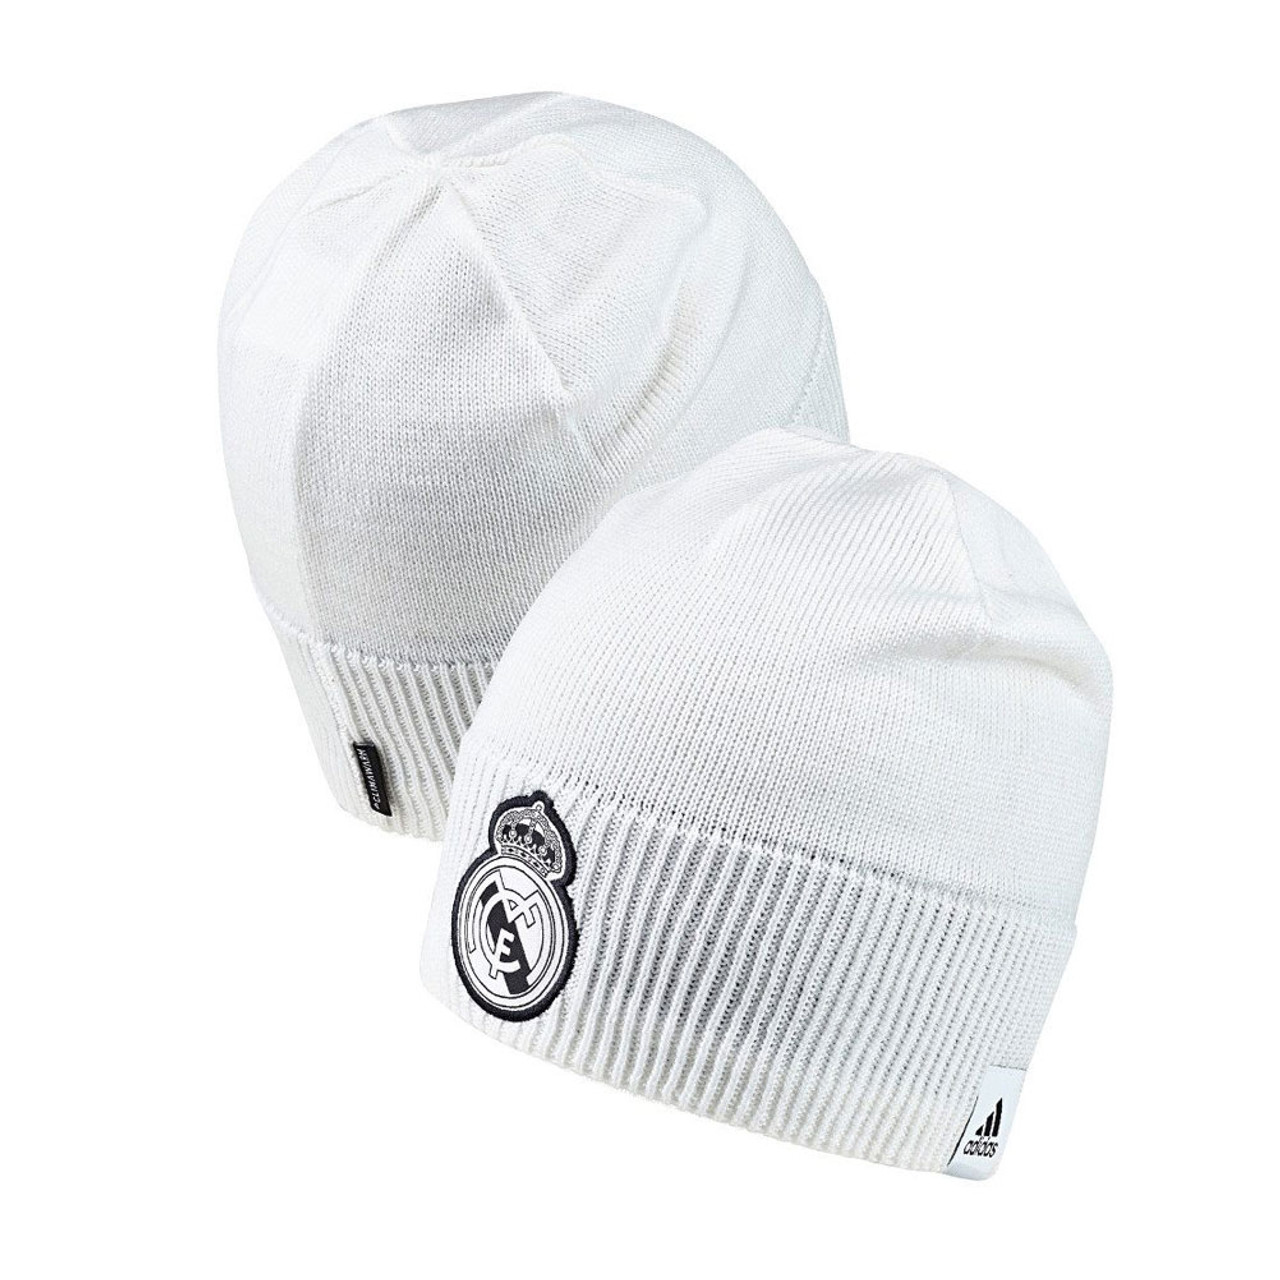 9f9b80bcd ADIDAS Real Madrid CL beanie hat [cream]